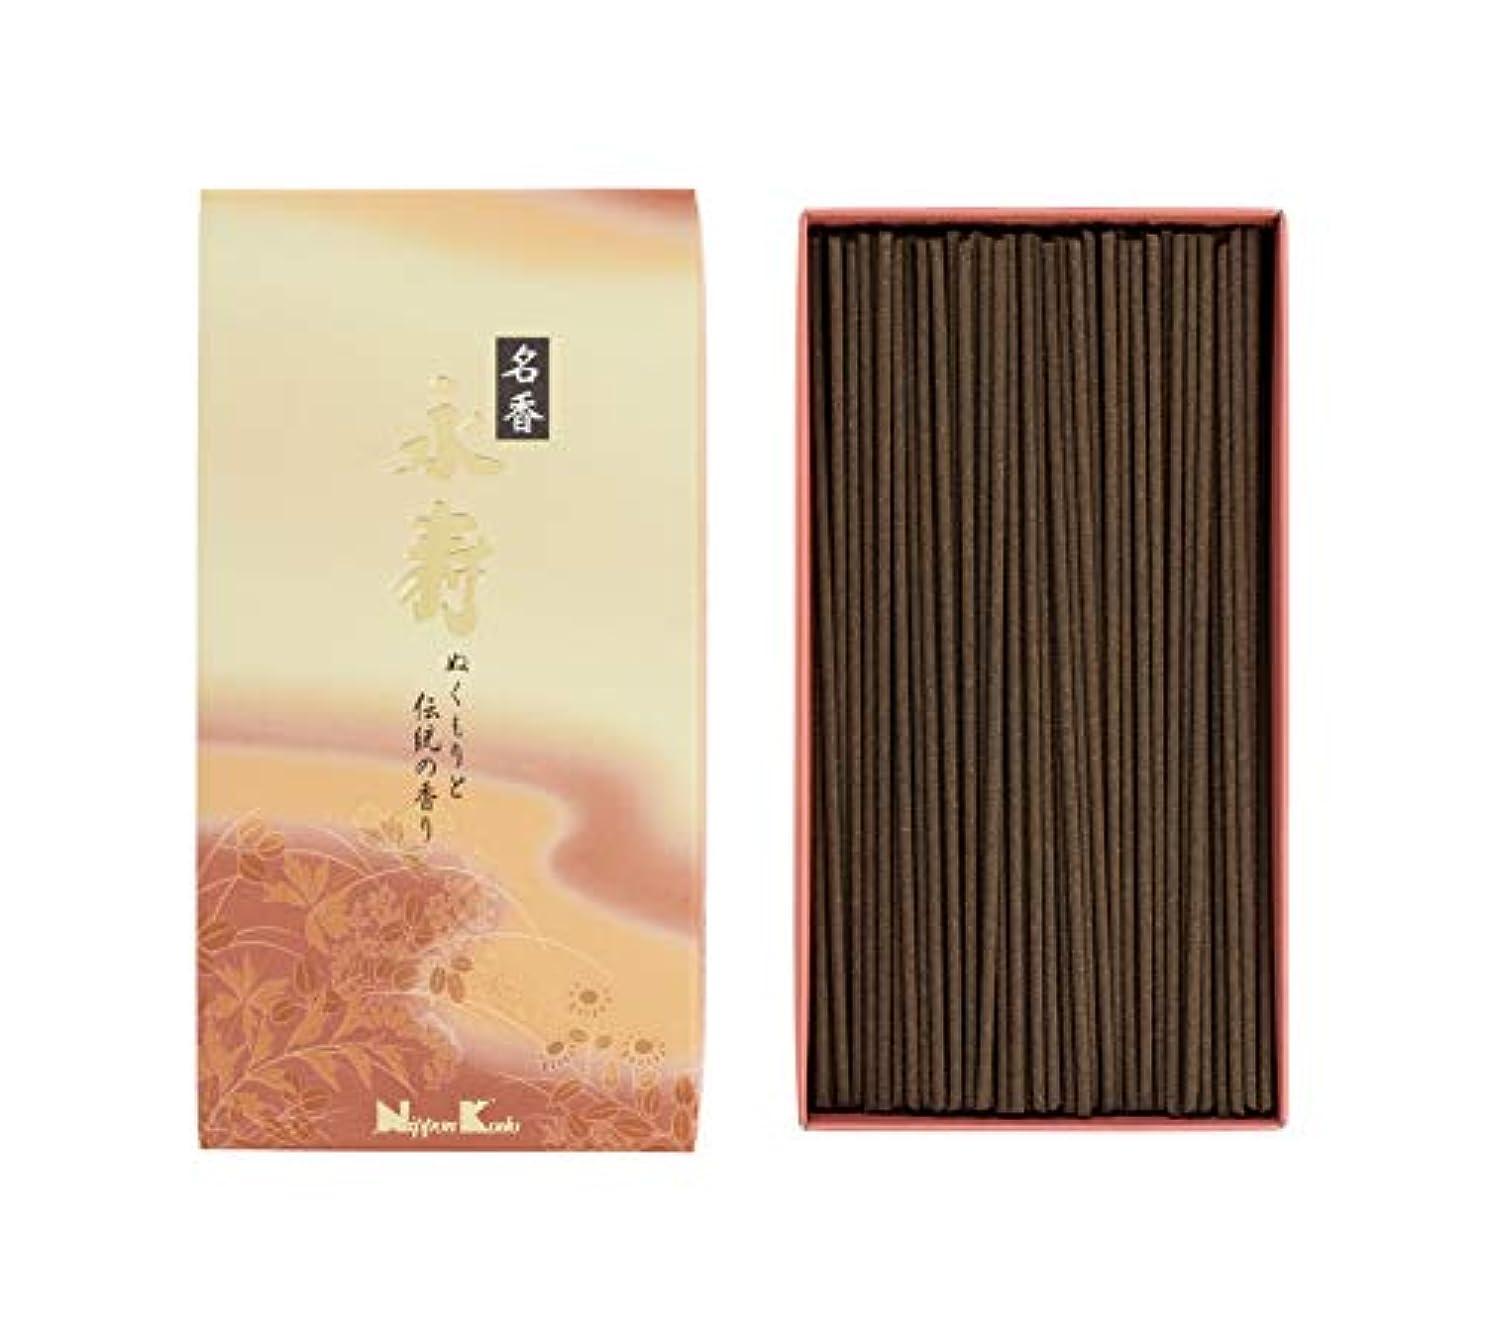 名香 永寿 バラ詰 22051